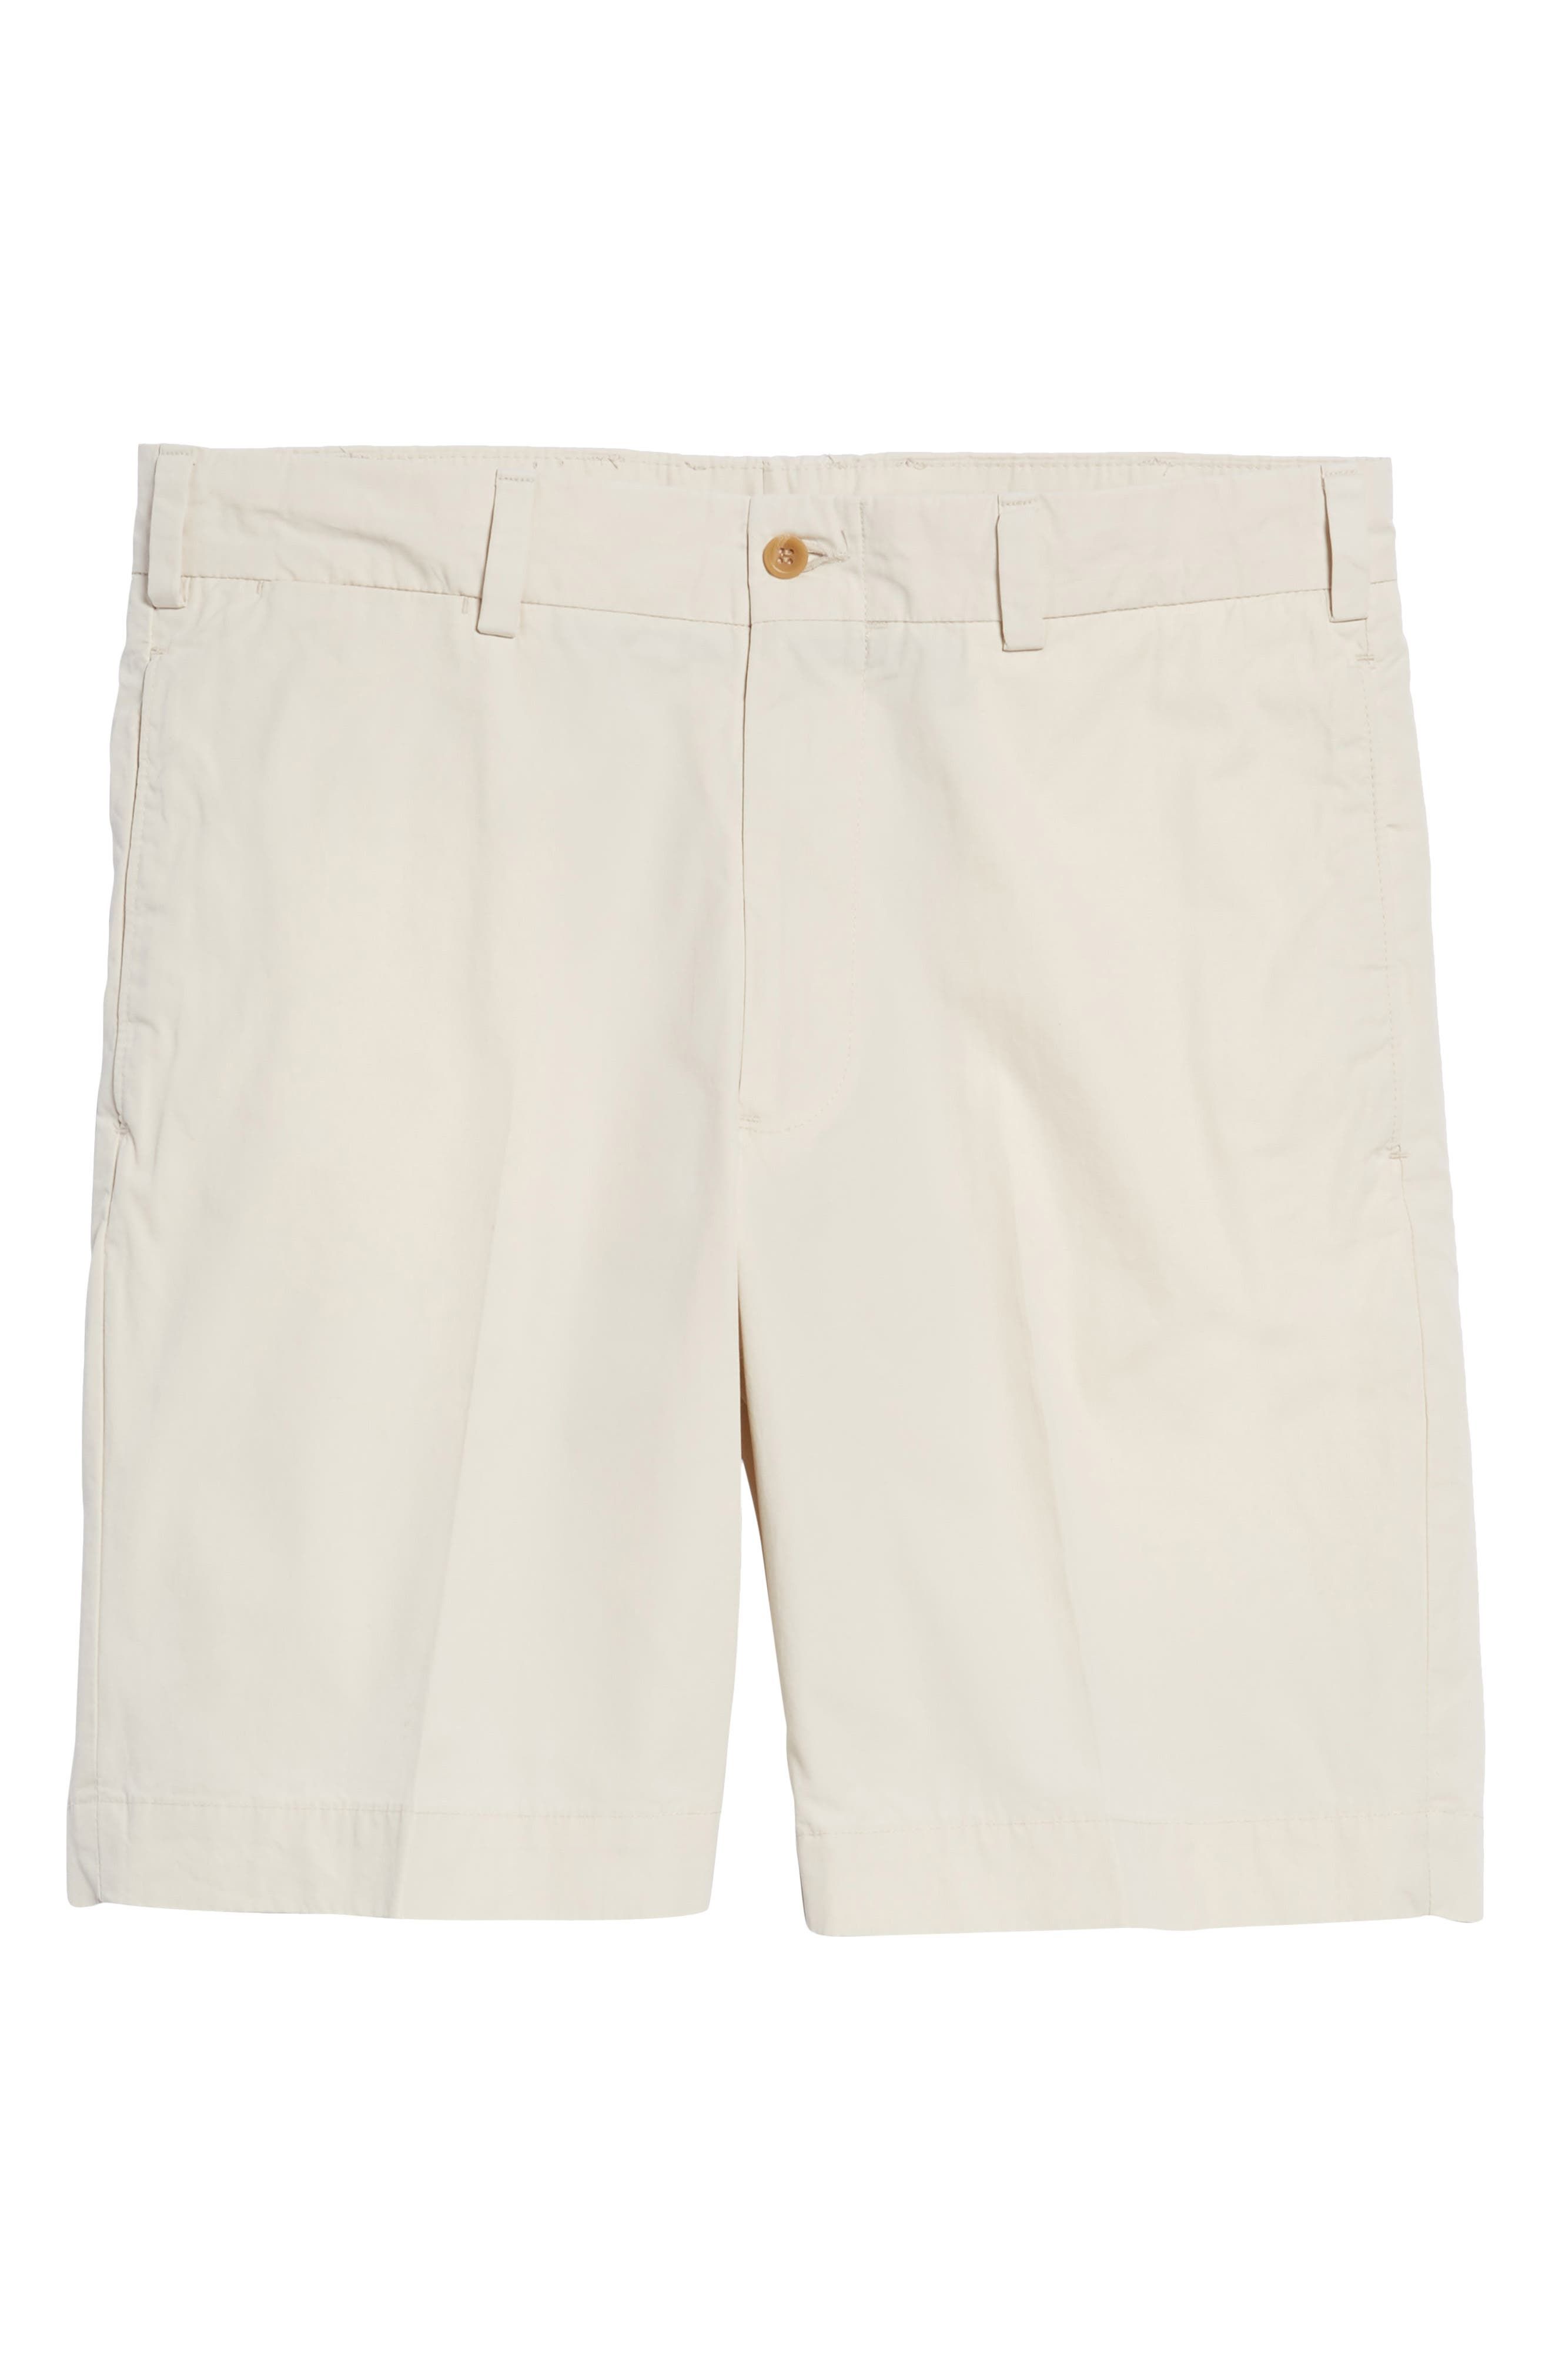 M2 Standard Fit Flat Front Tropical Cotton Poplin Shorts,                             Alternate thumbnail 6, color,                             280